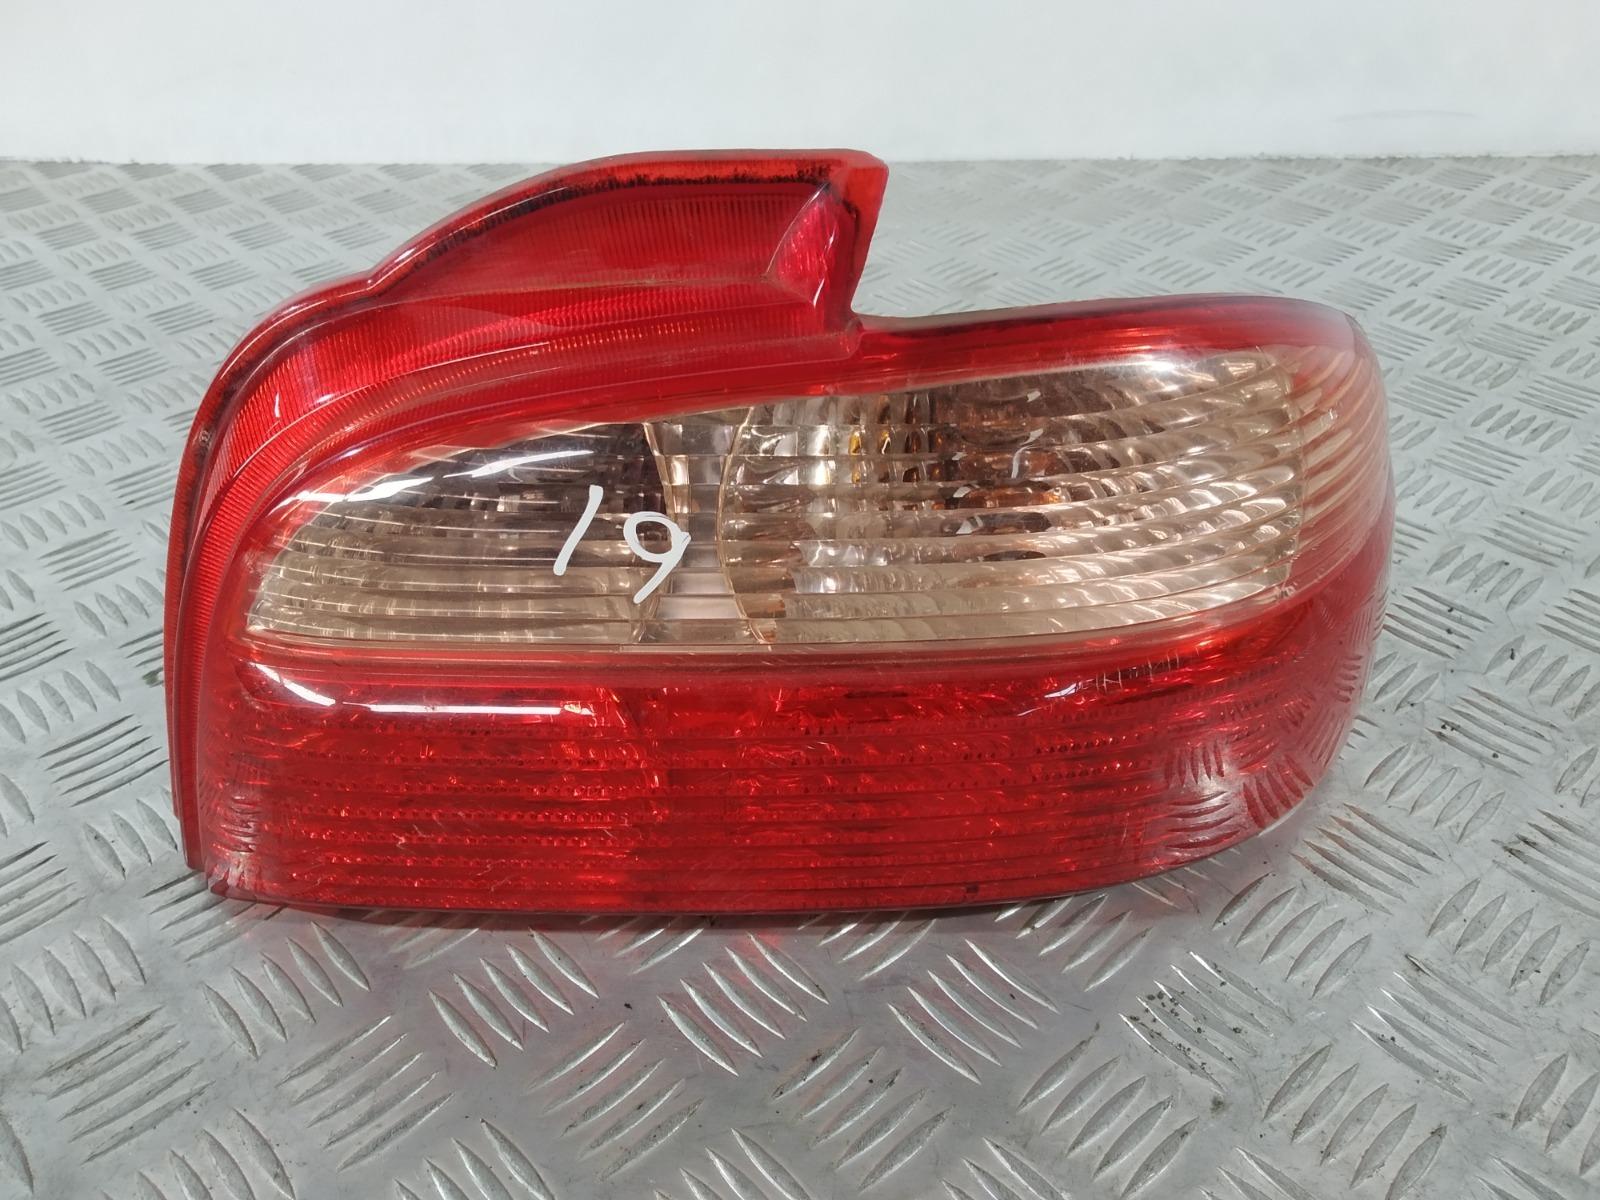 Фонарь задний правый Toyota Avensis 1.8 I 2001 (б/у)